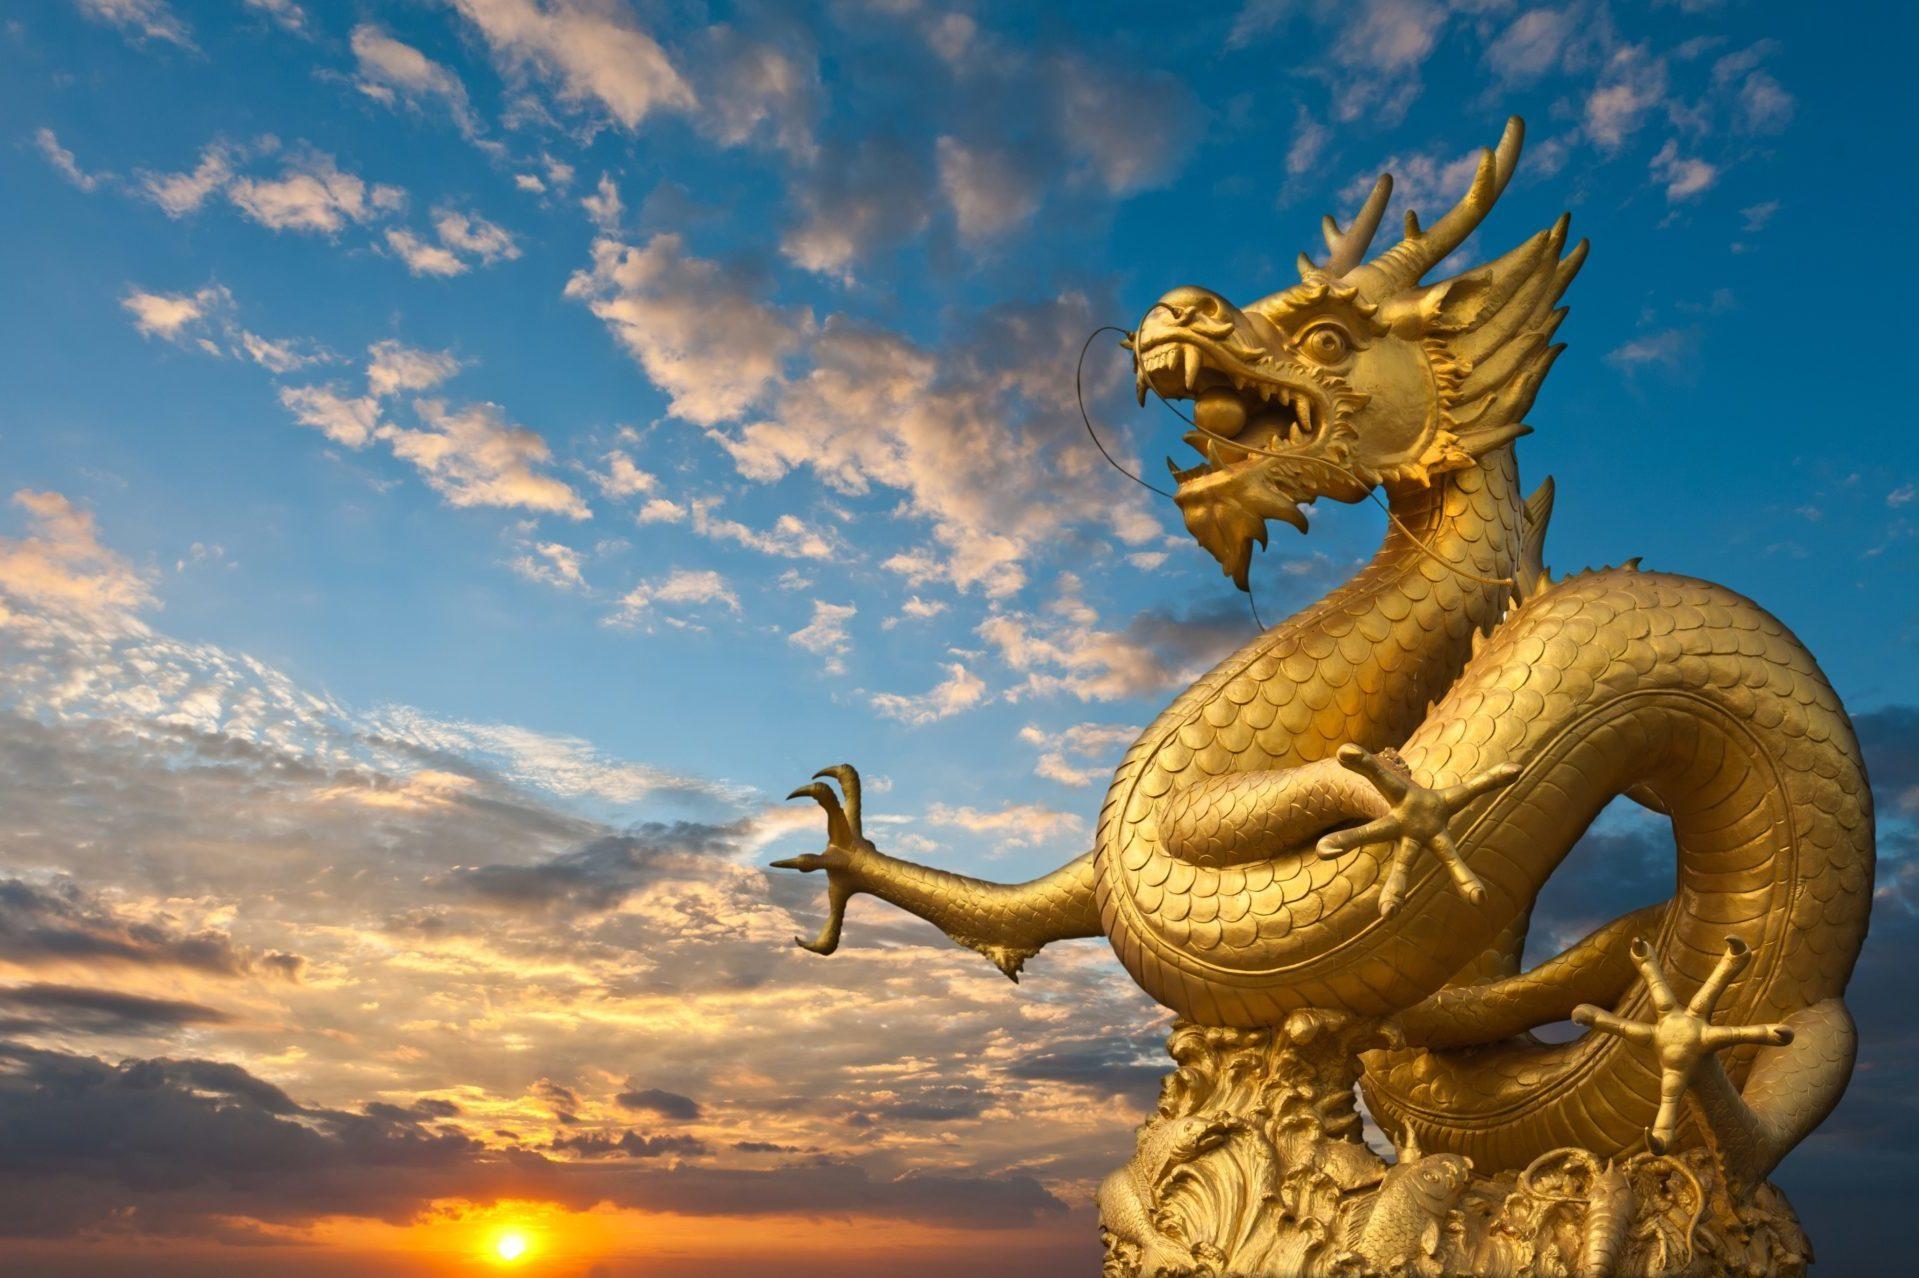 mandarin school trip to China